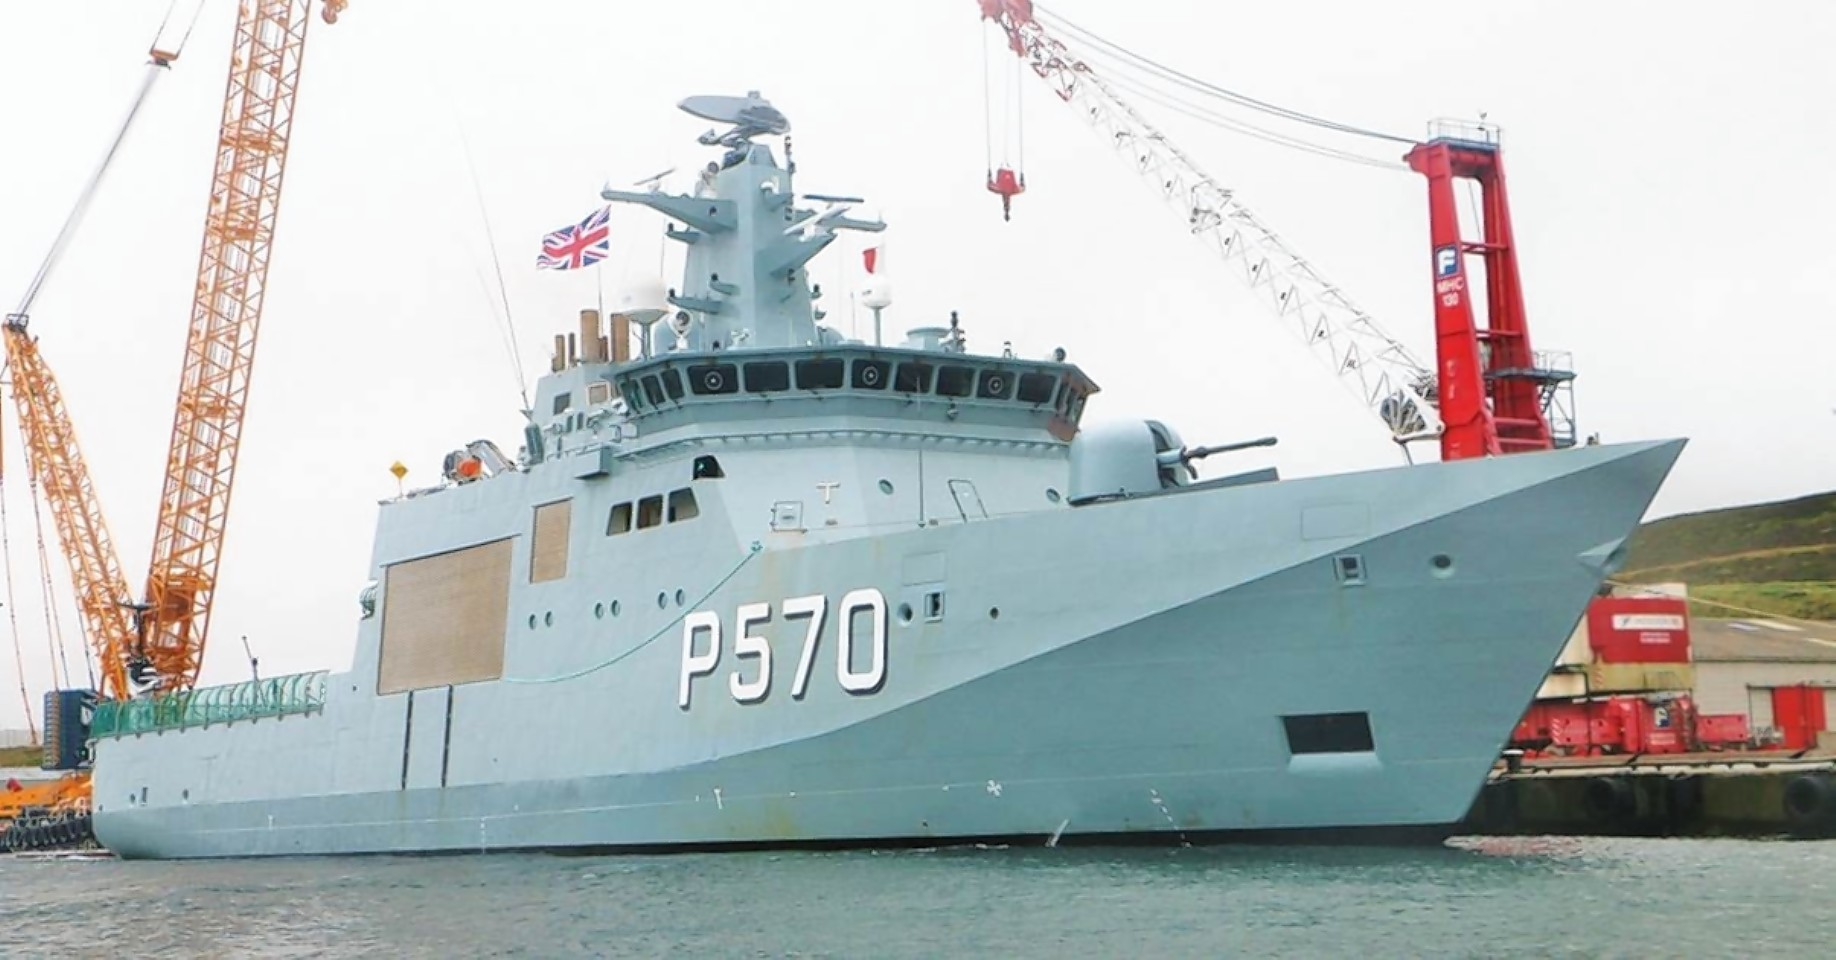 The Danish naval ship in Lerwick Harbour